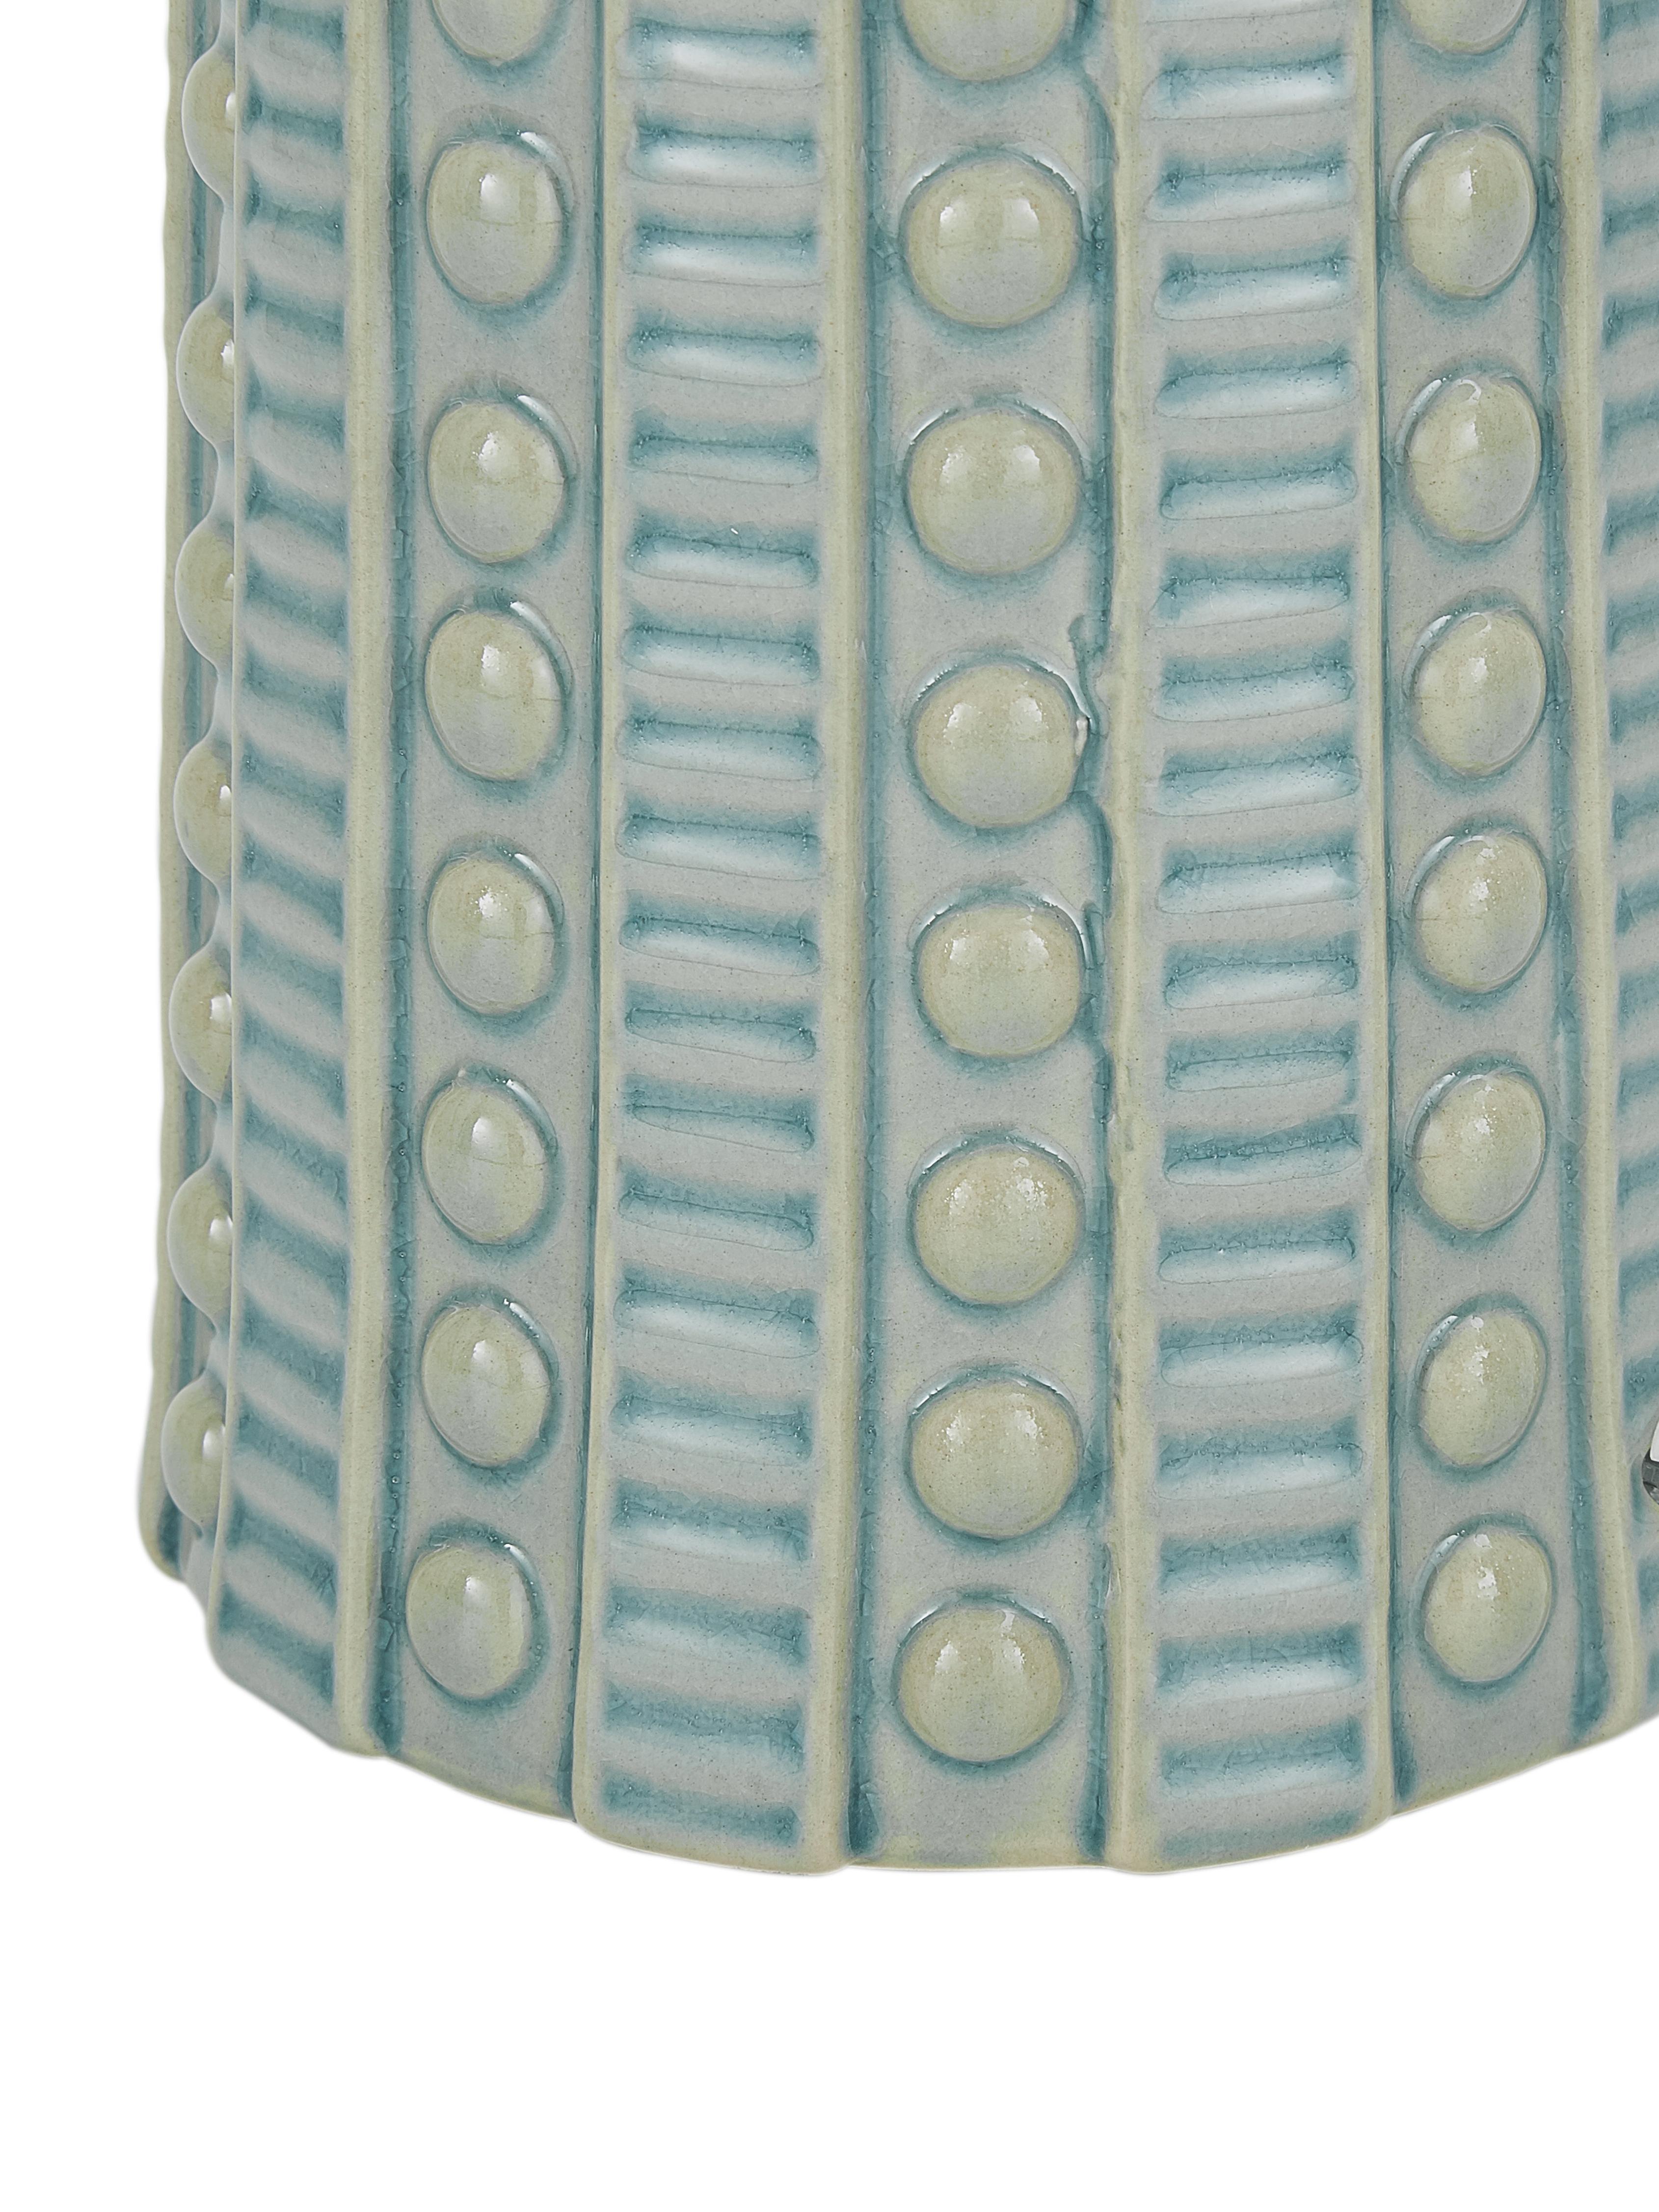 Große Keramik-Tischlampe Nizza in Salbeigrün, Lampenschirm: Textil, Lampenfuß: Keramik, Salbeigrün, Ø 35 x H 60 cm